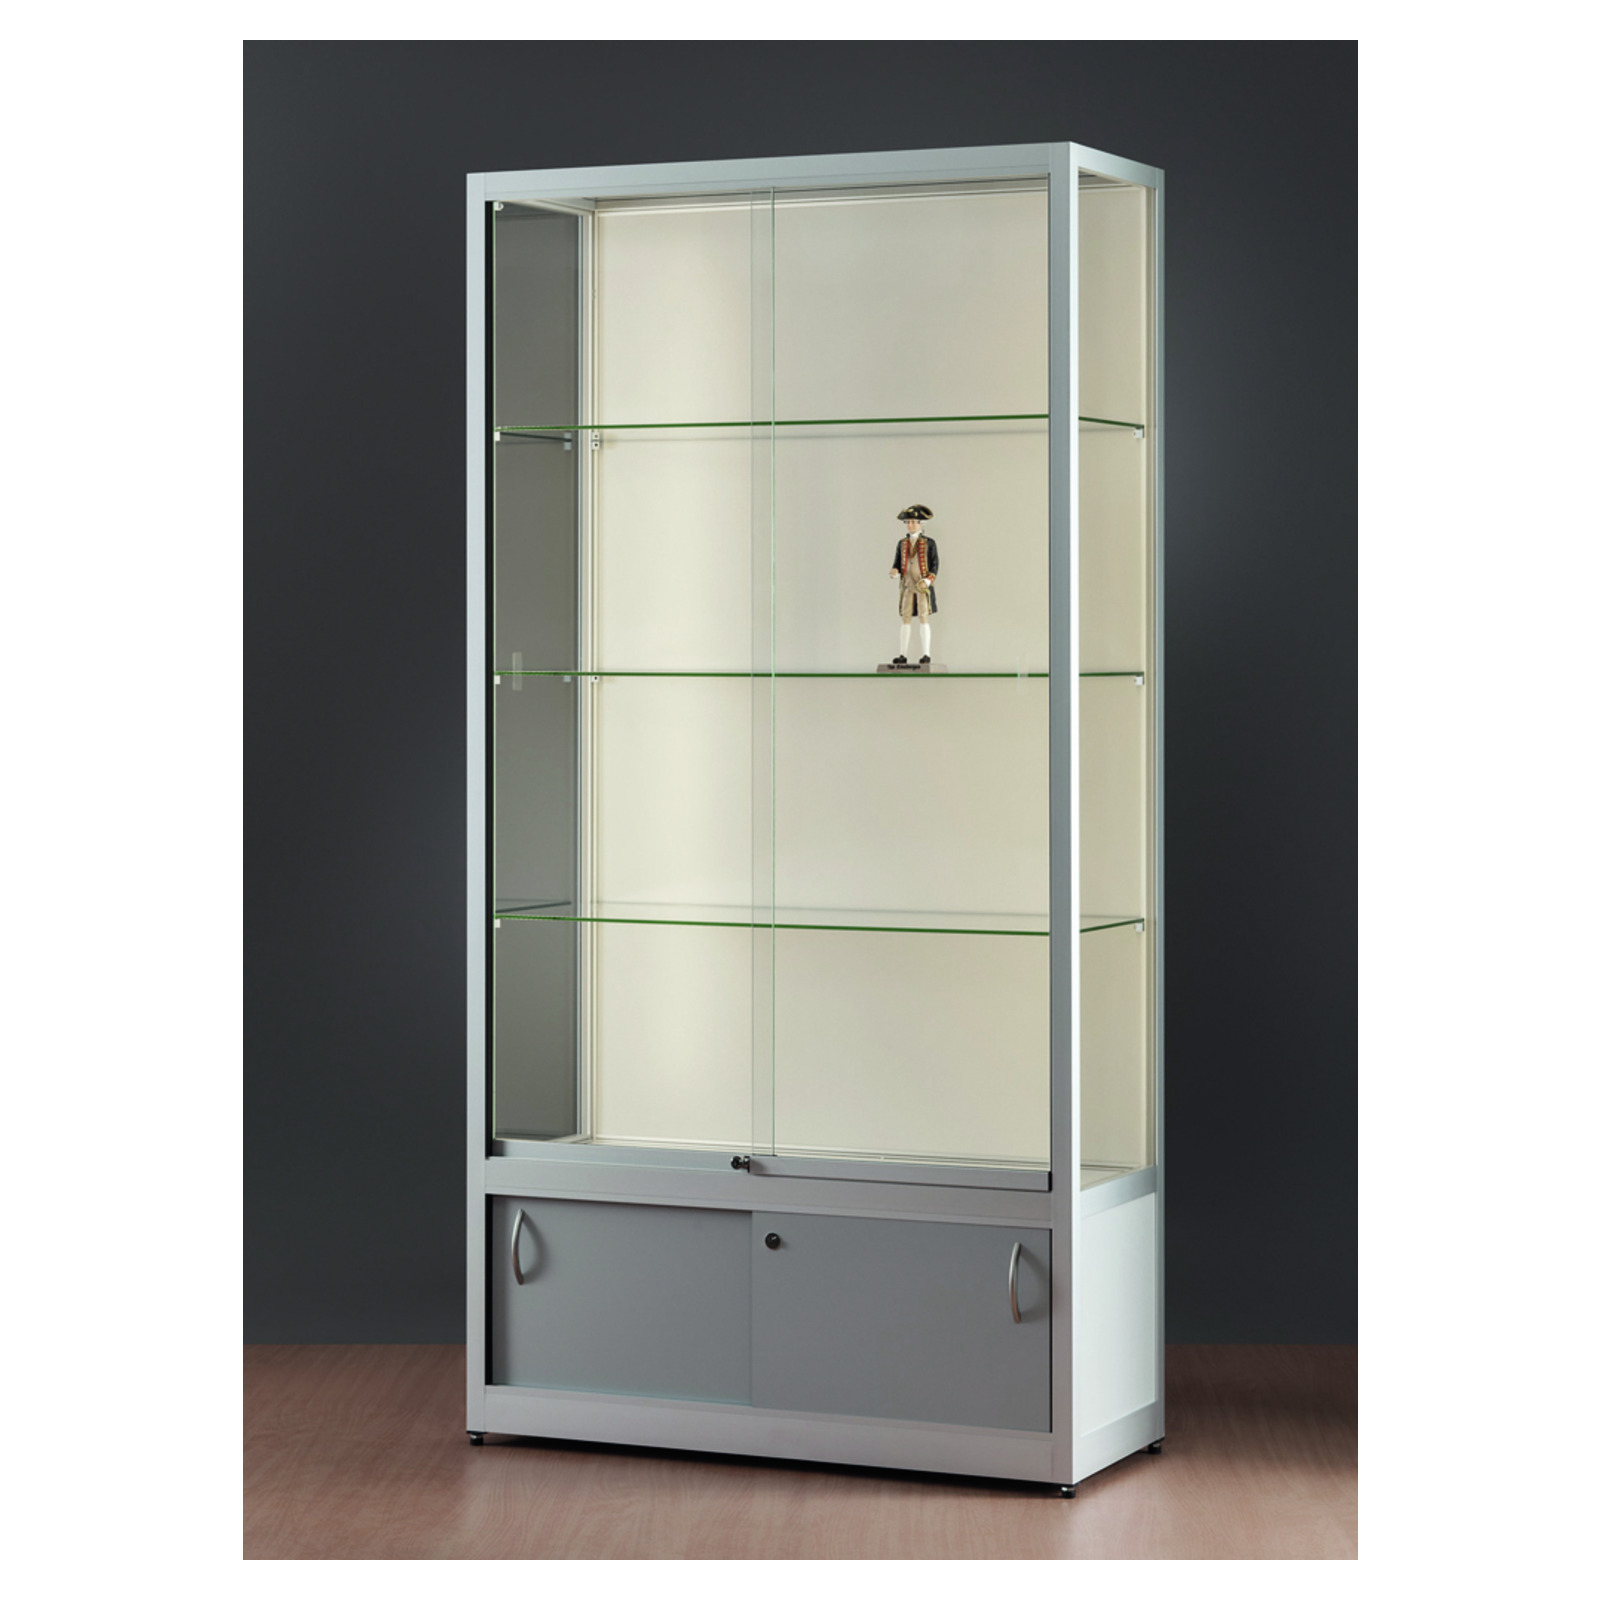 profilvitrine 100 cm mit schrank und led stripe beleuchtung verkaufsvitrine led vitrinen. Black Bedroom Furniture Sets. Home Design Ideas